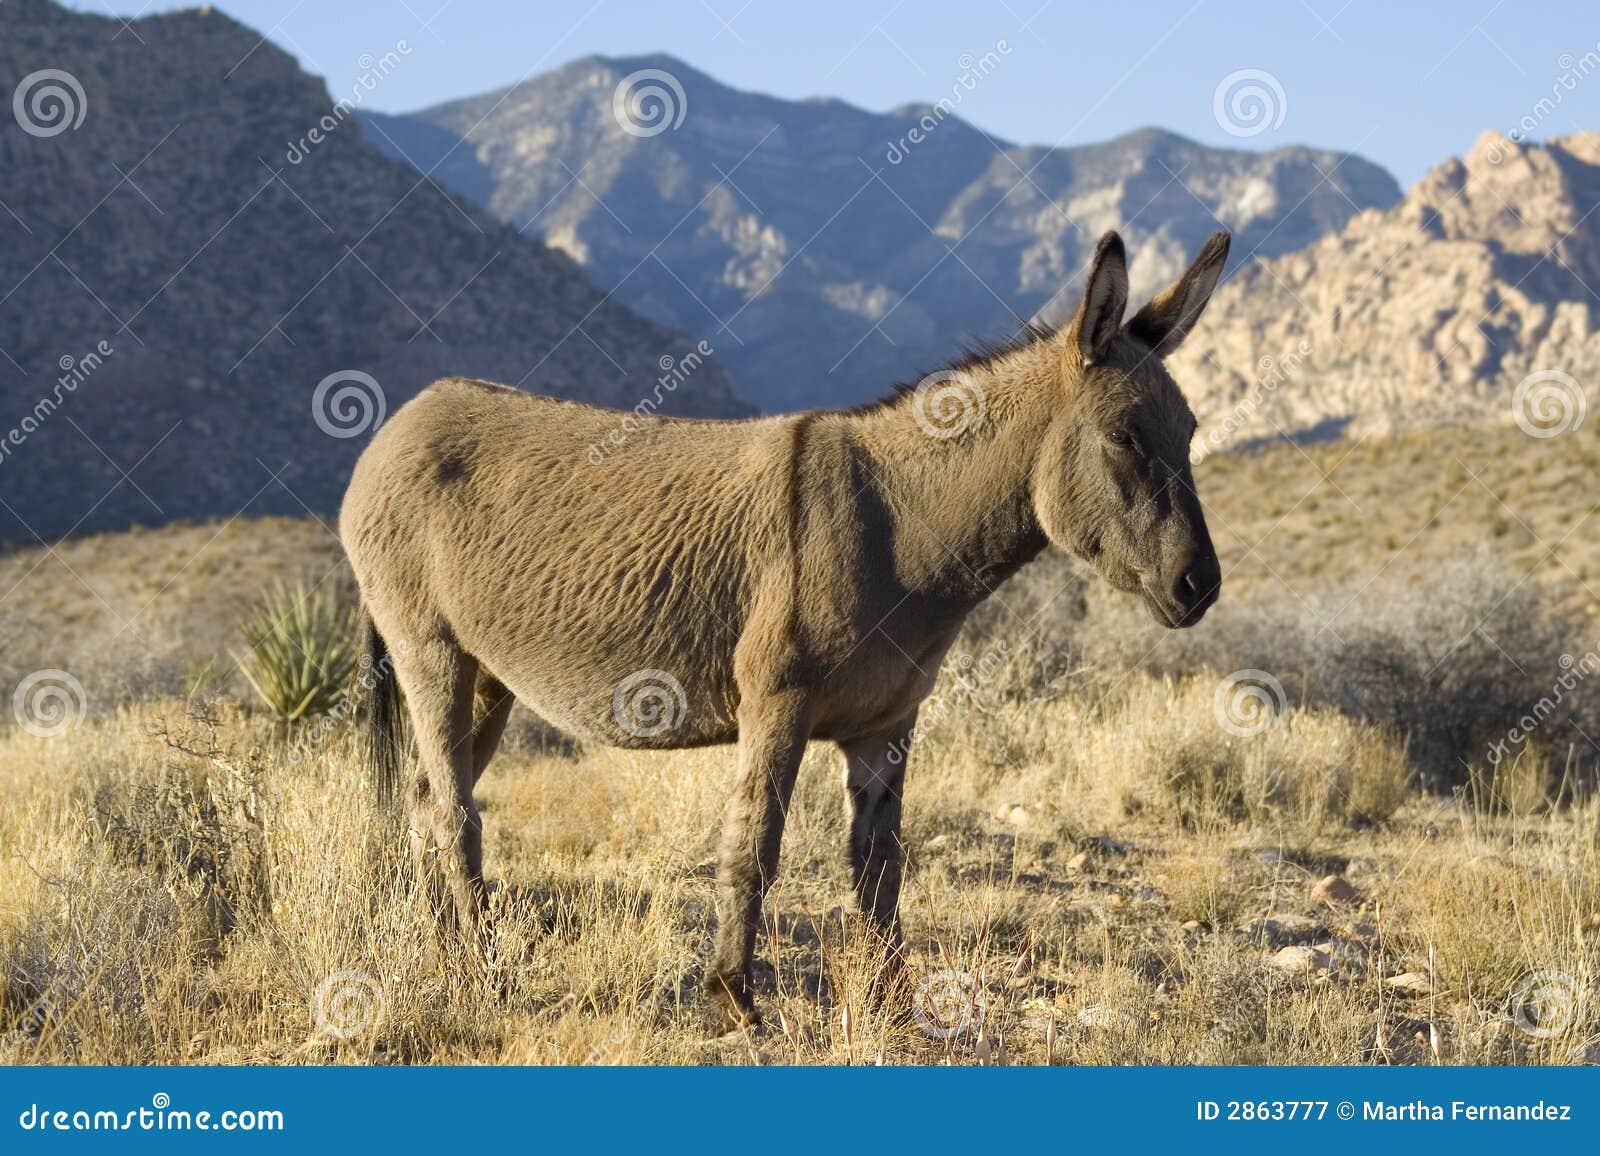 all for free credit burros manaderos